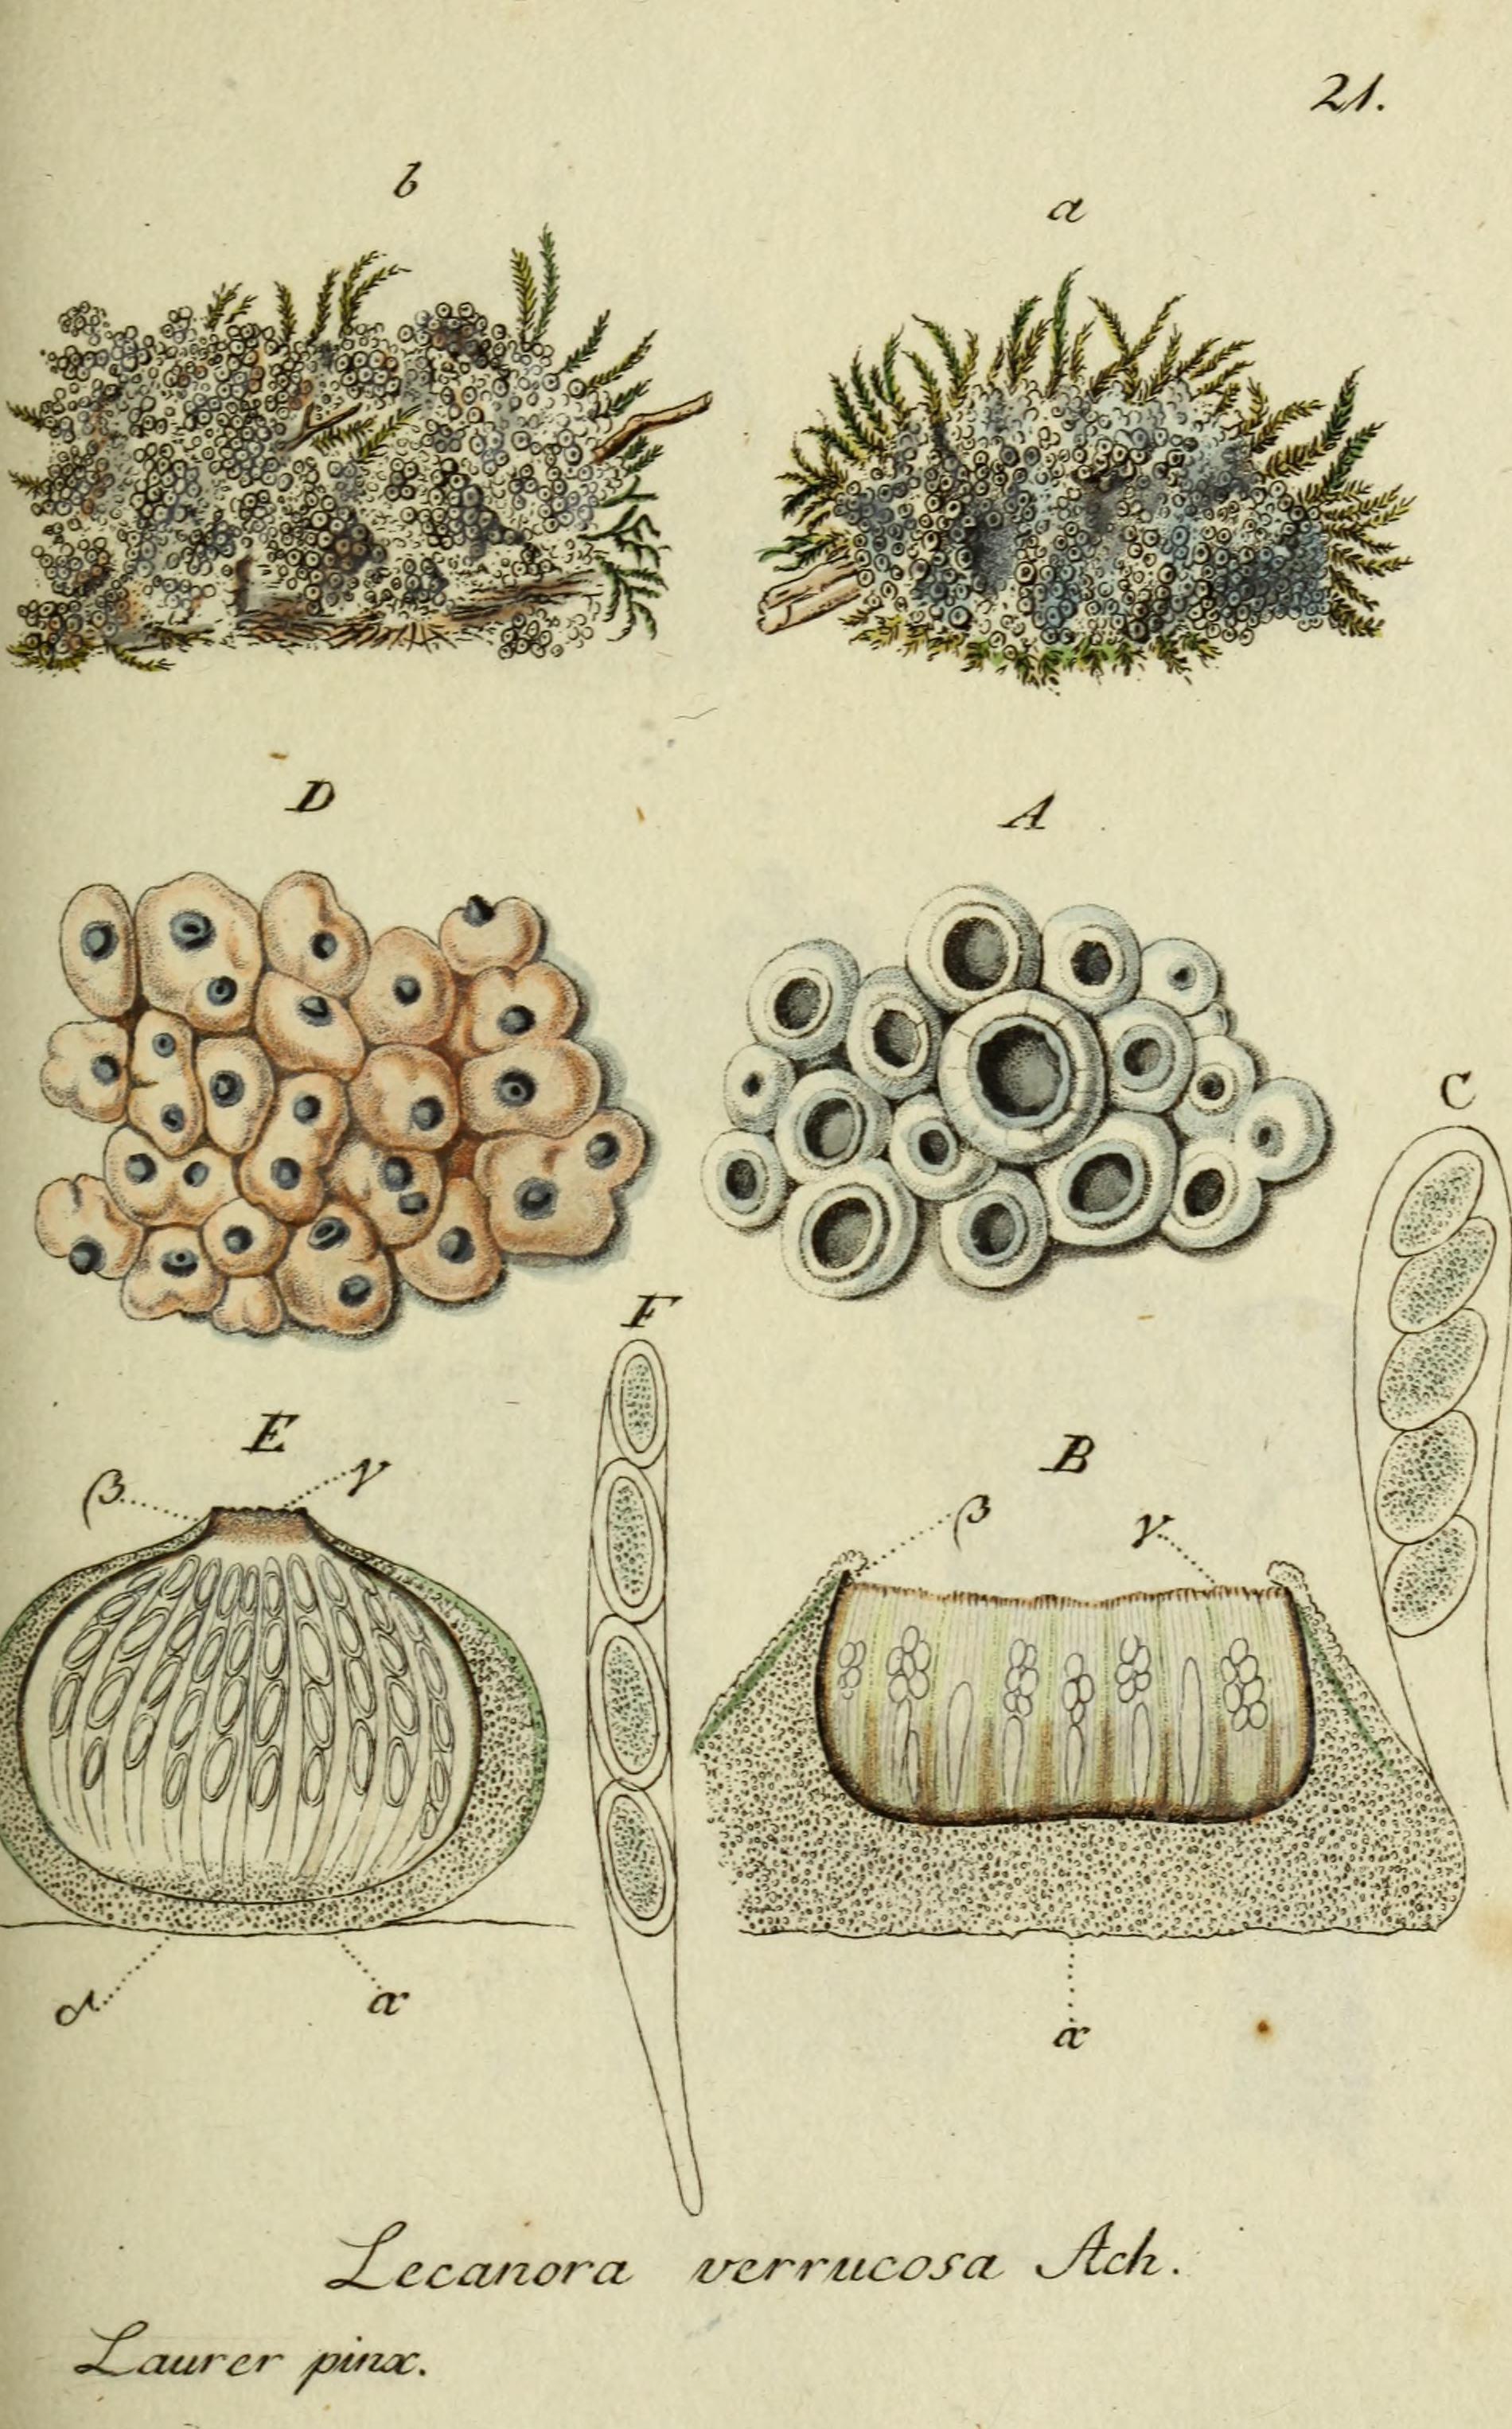 Image of Lecanora